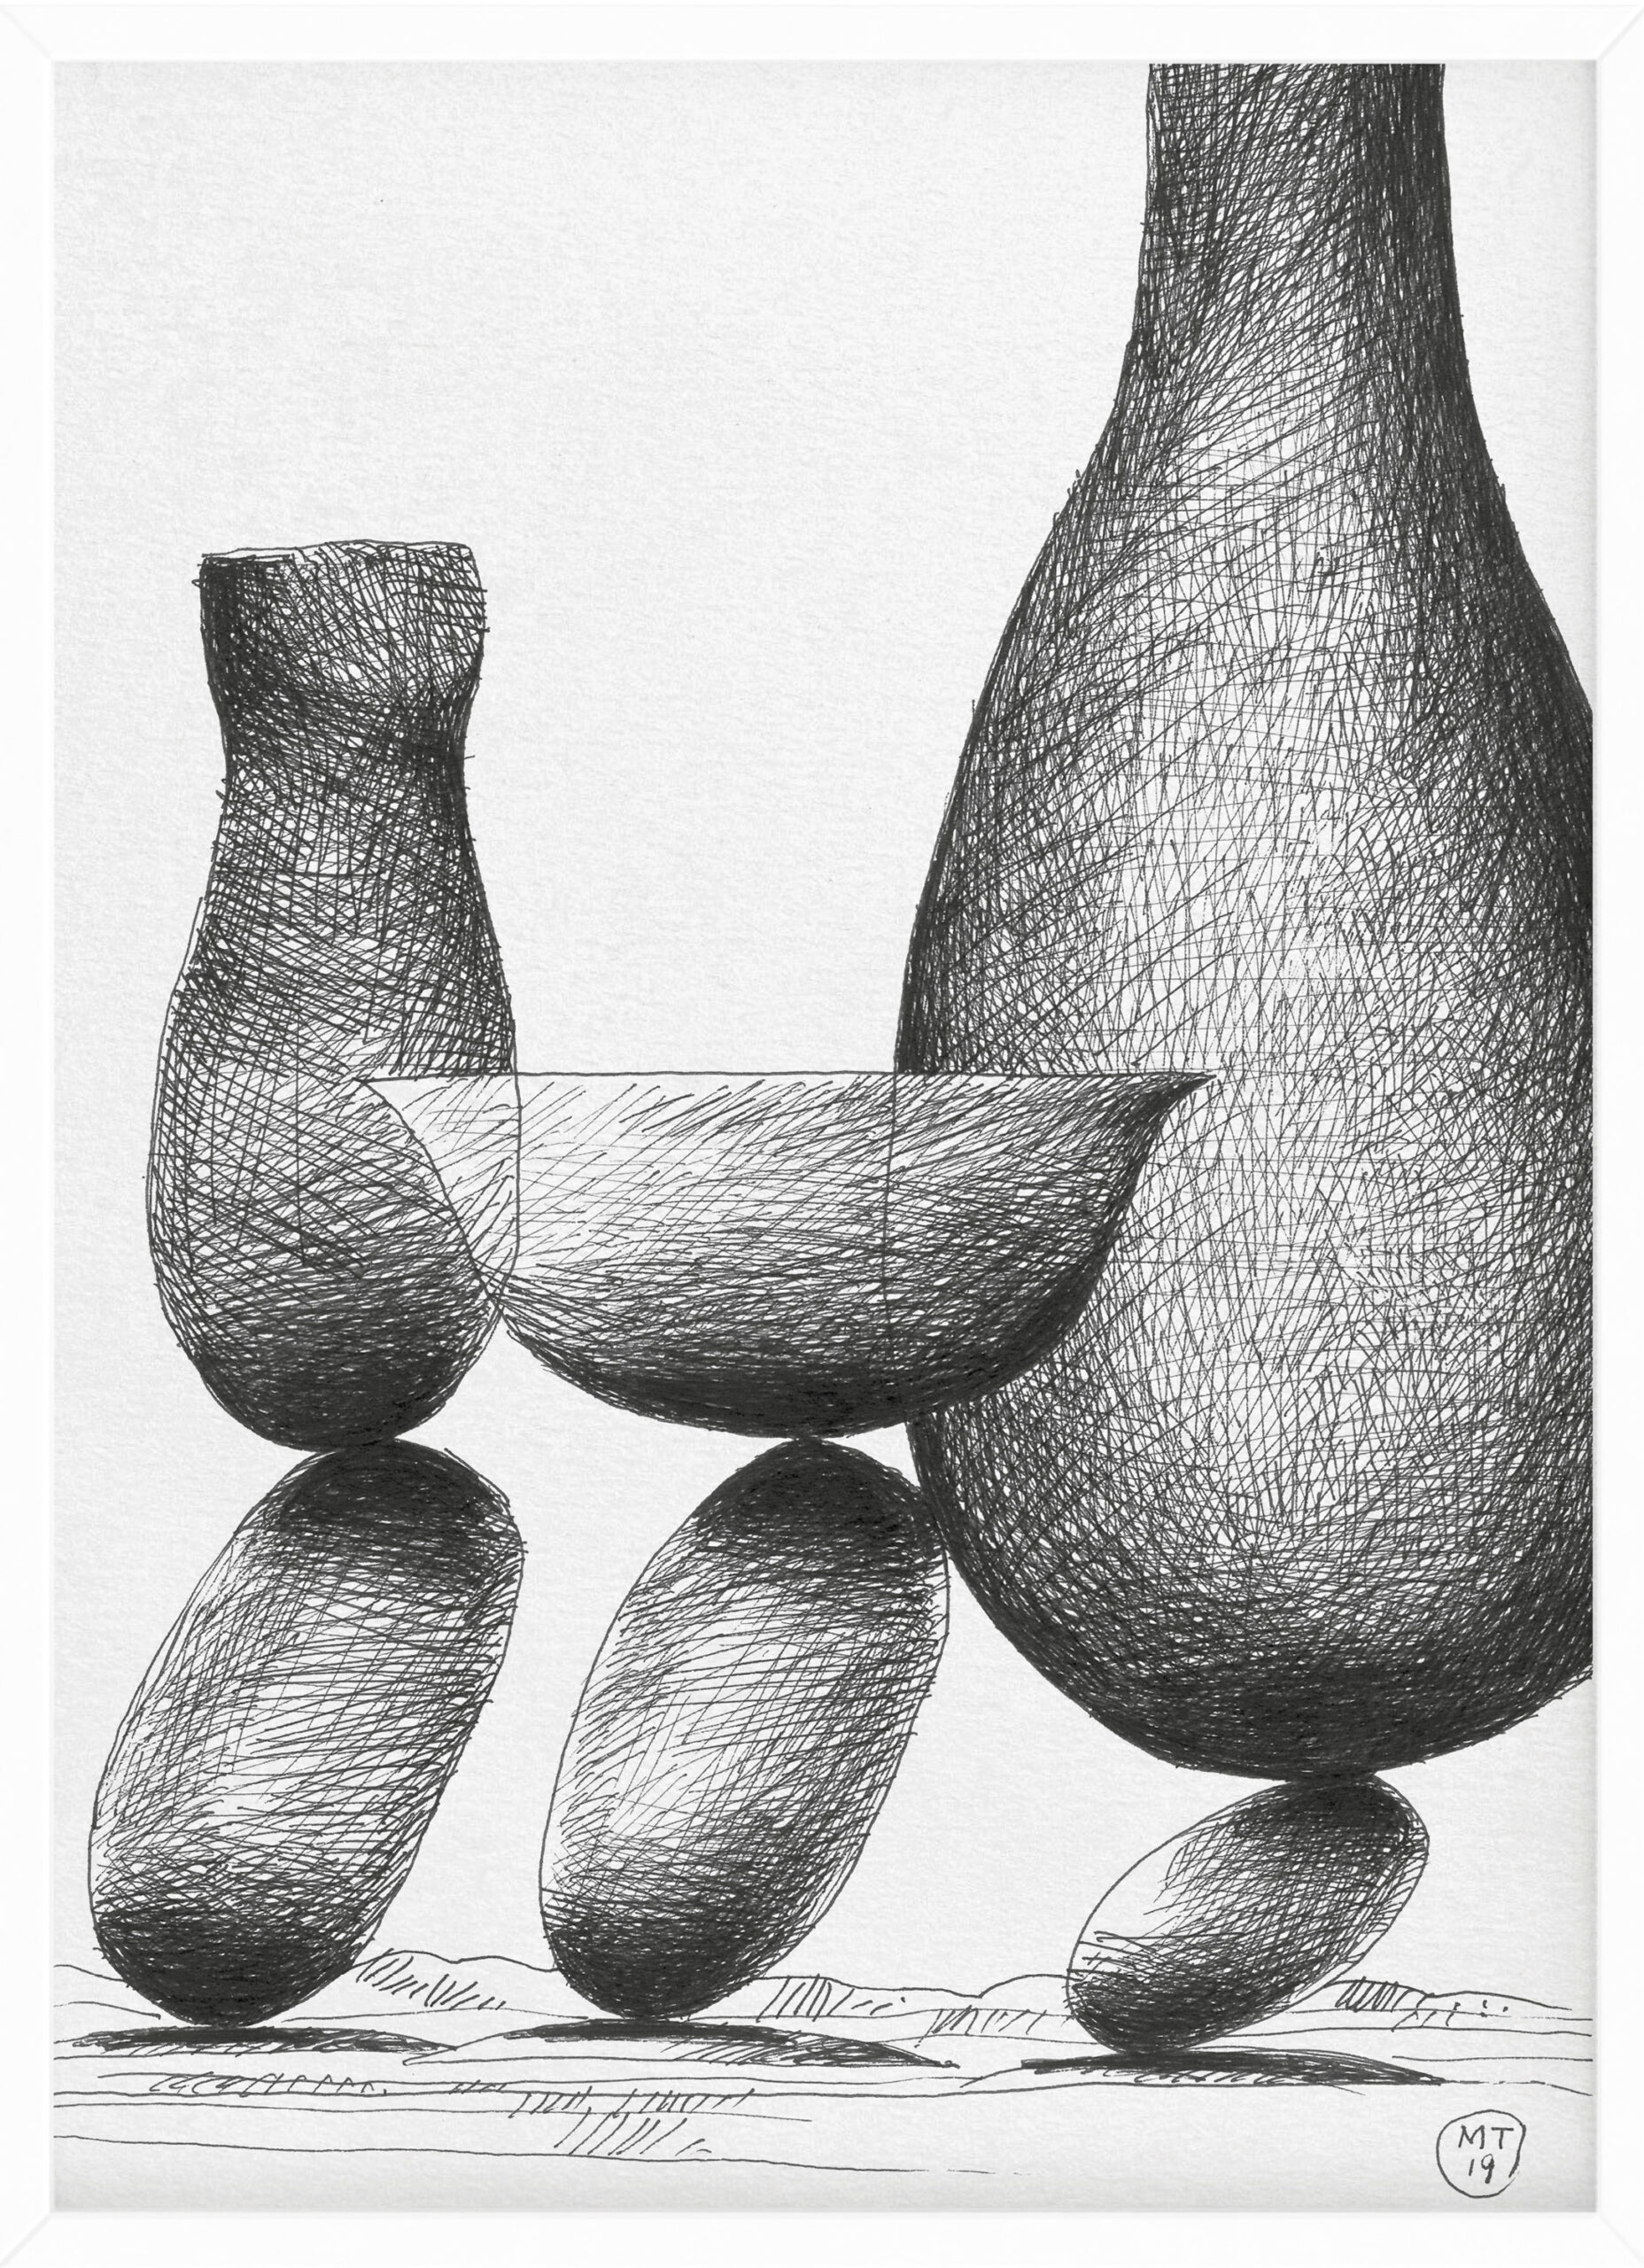 Rain | Drawings | Mario Trimarchi Design